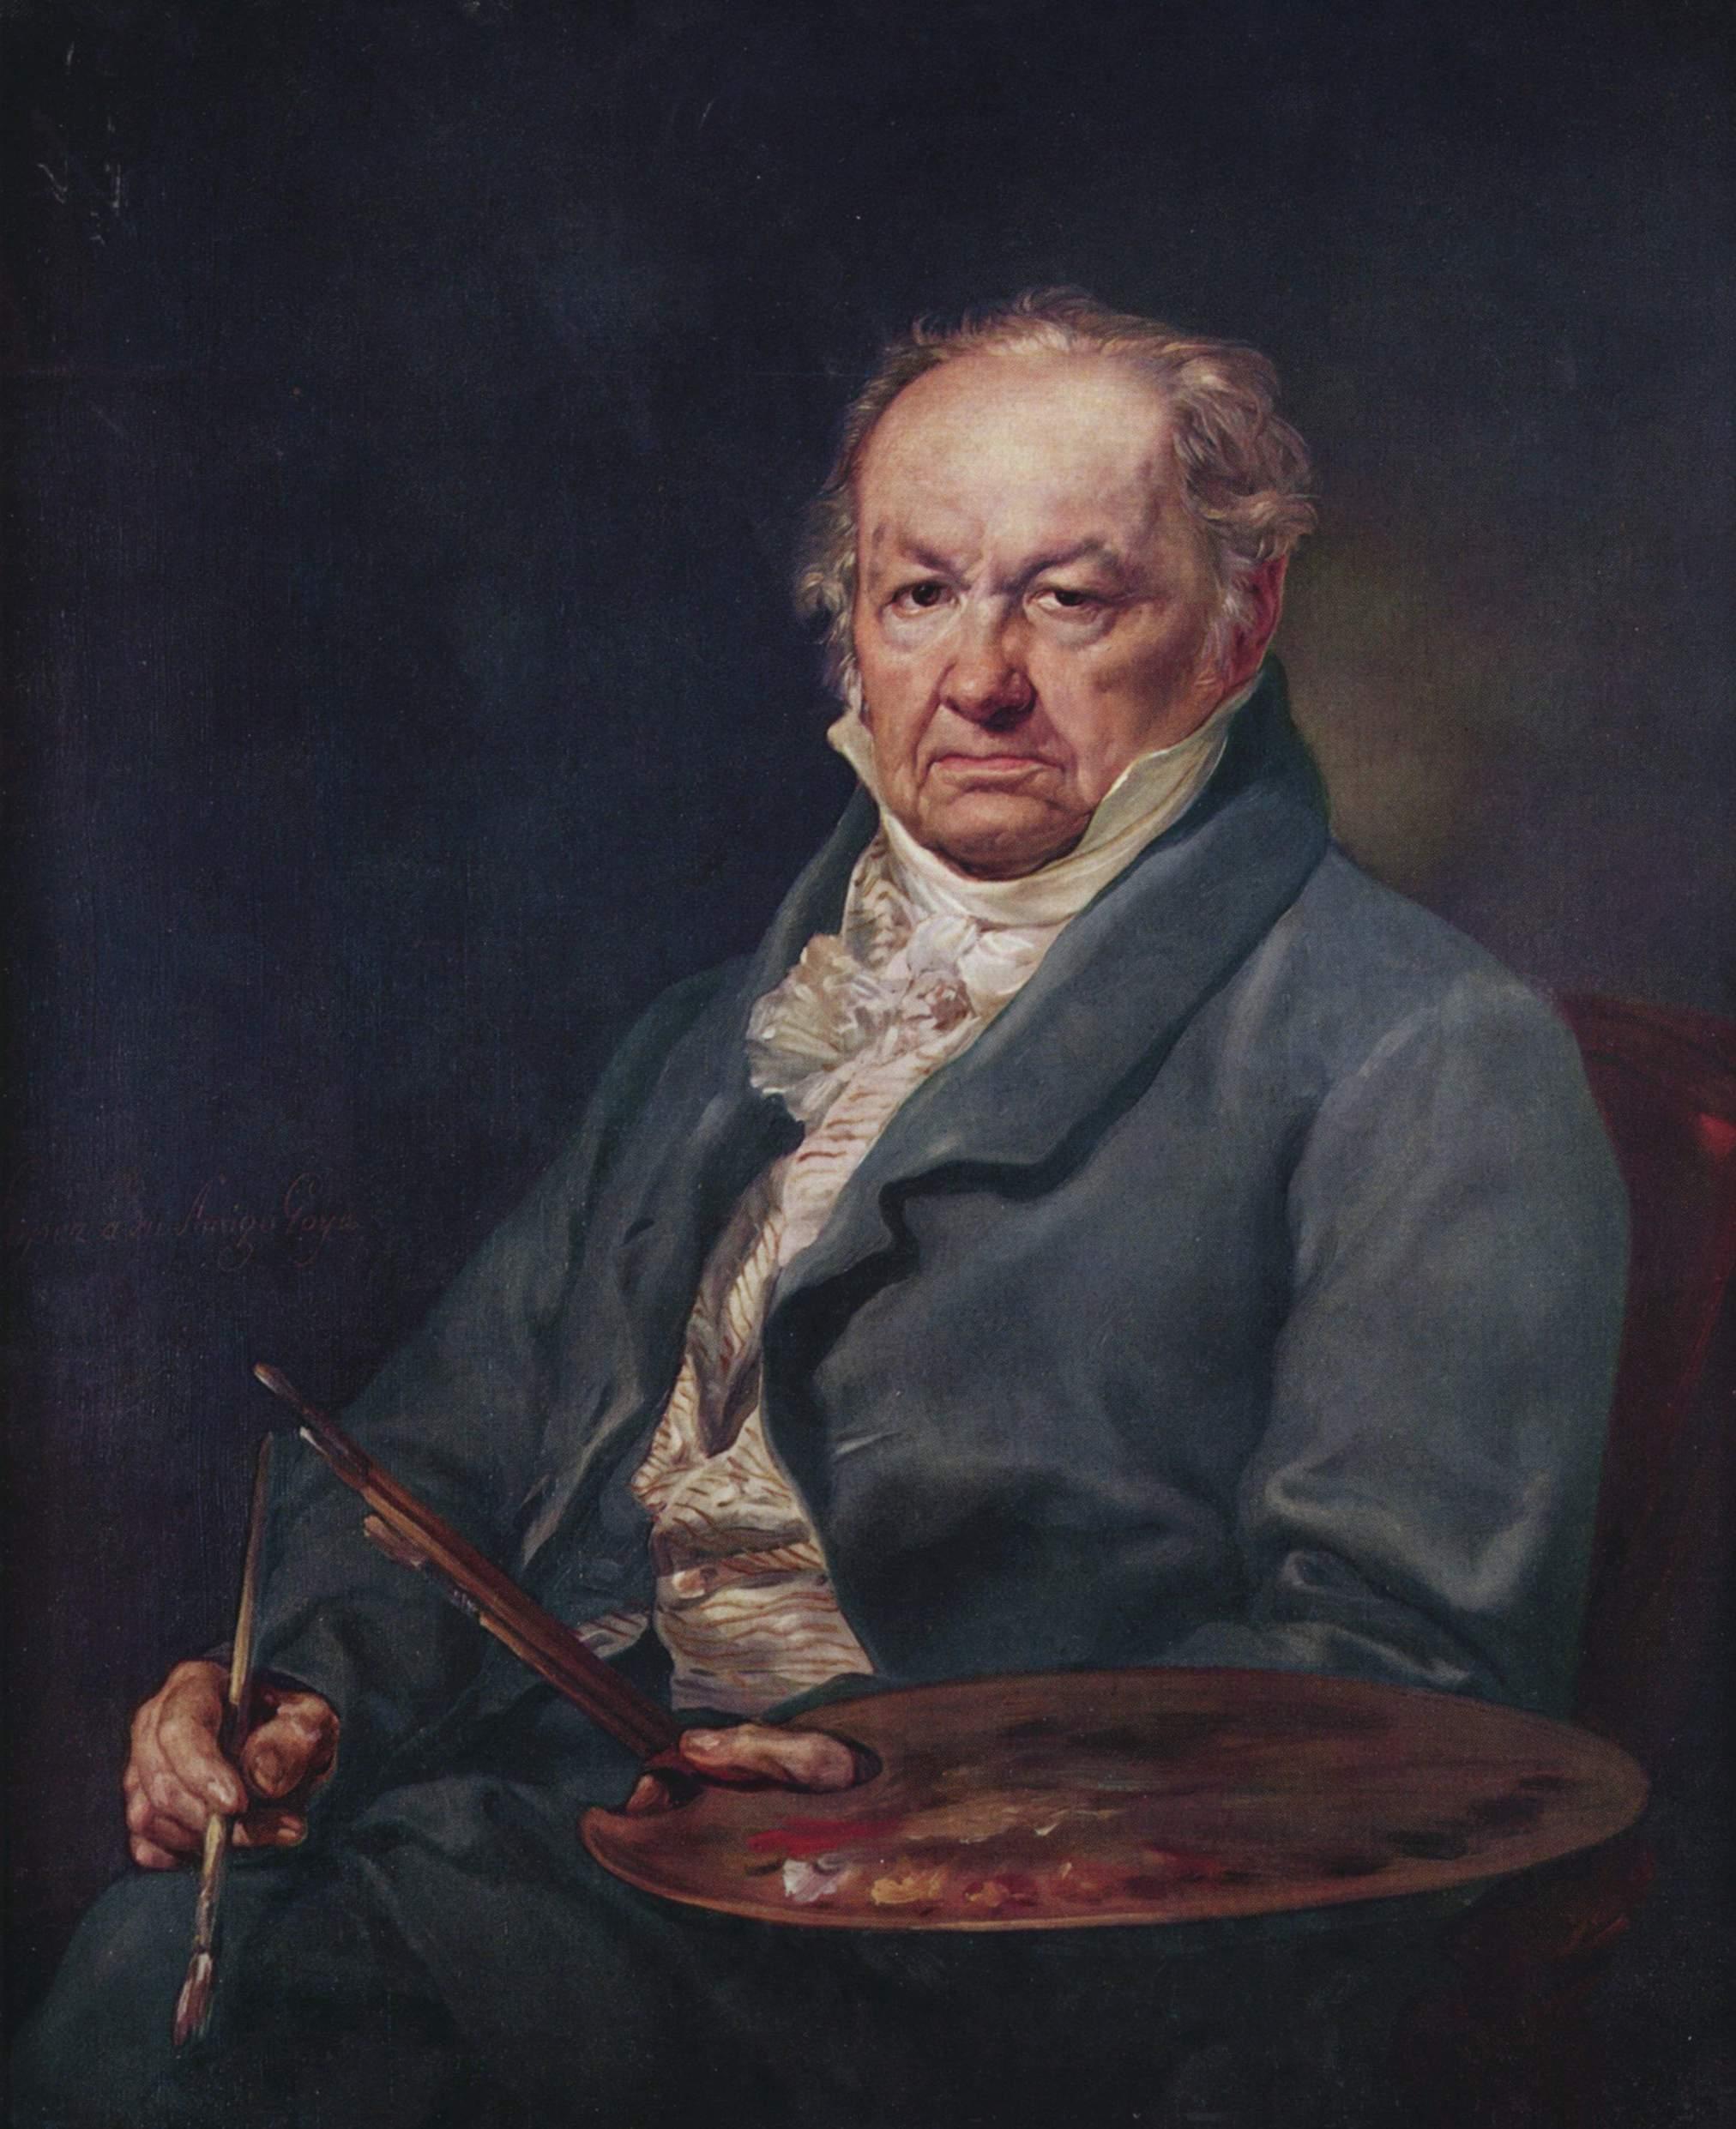 Portrait of Francisco De Goya